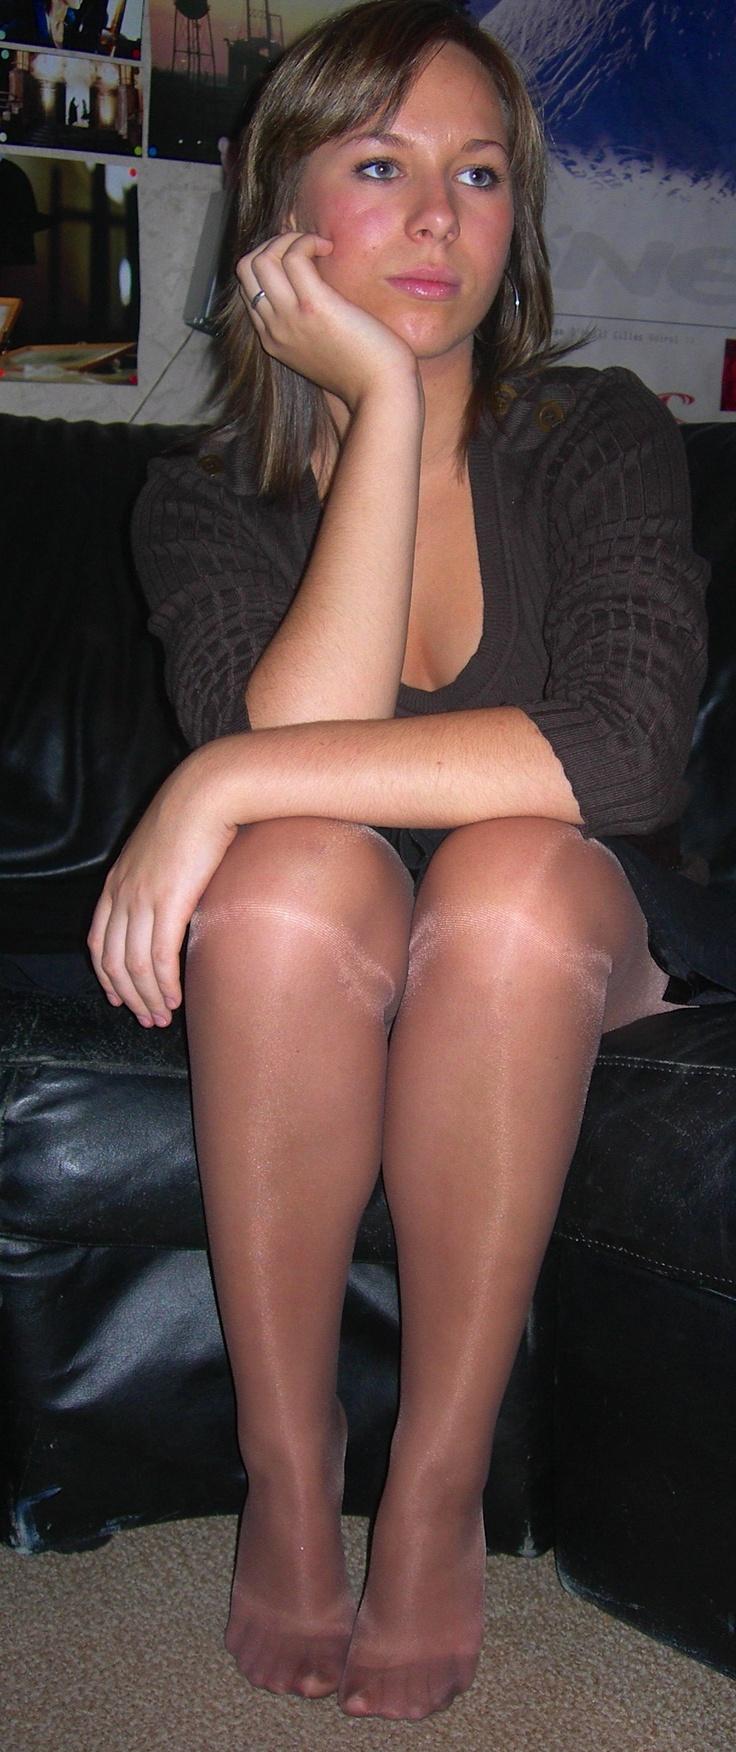 Feet In Pantyhose Sexy Women 55